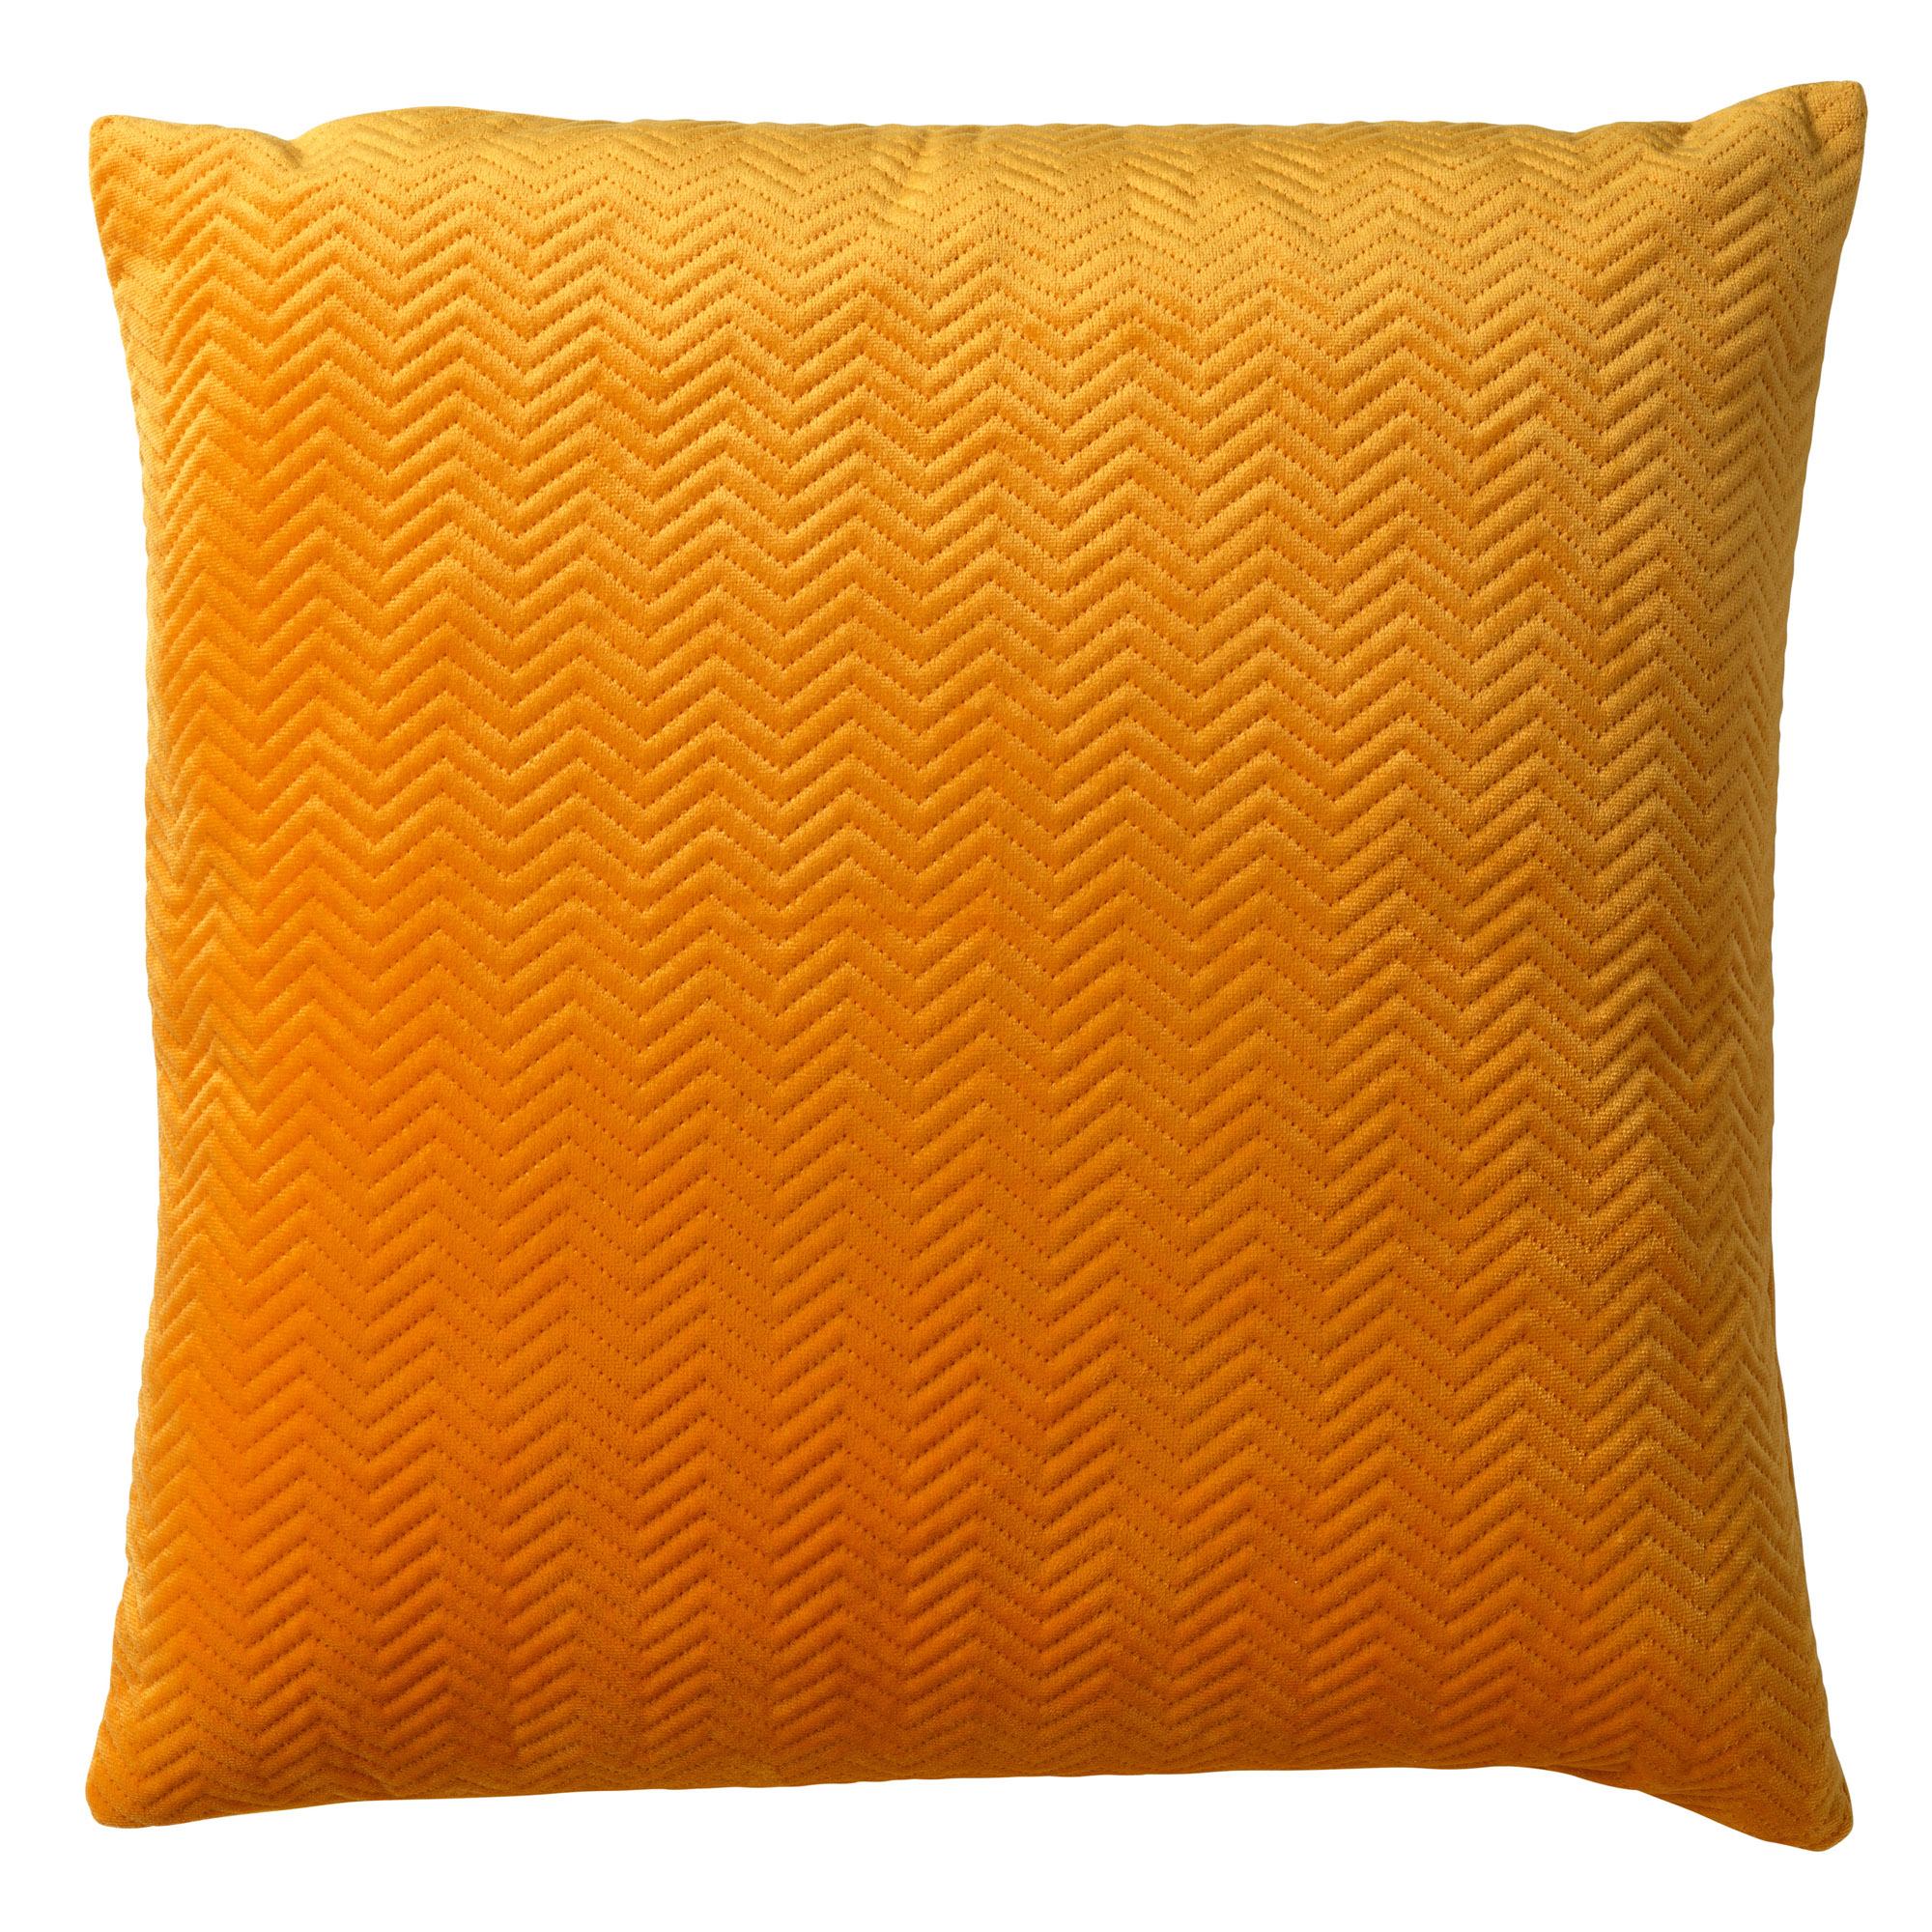 DIAZ - Sierkussen velvet Golden Glow 45x45 cm